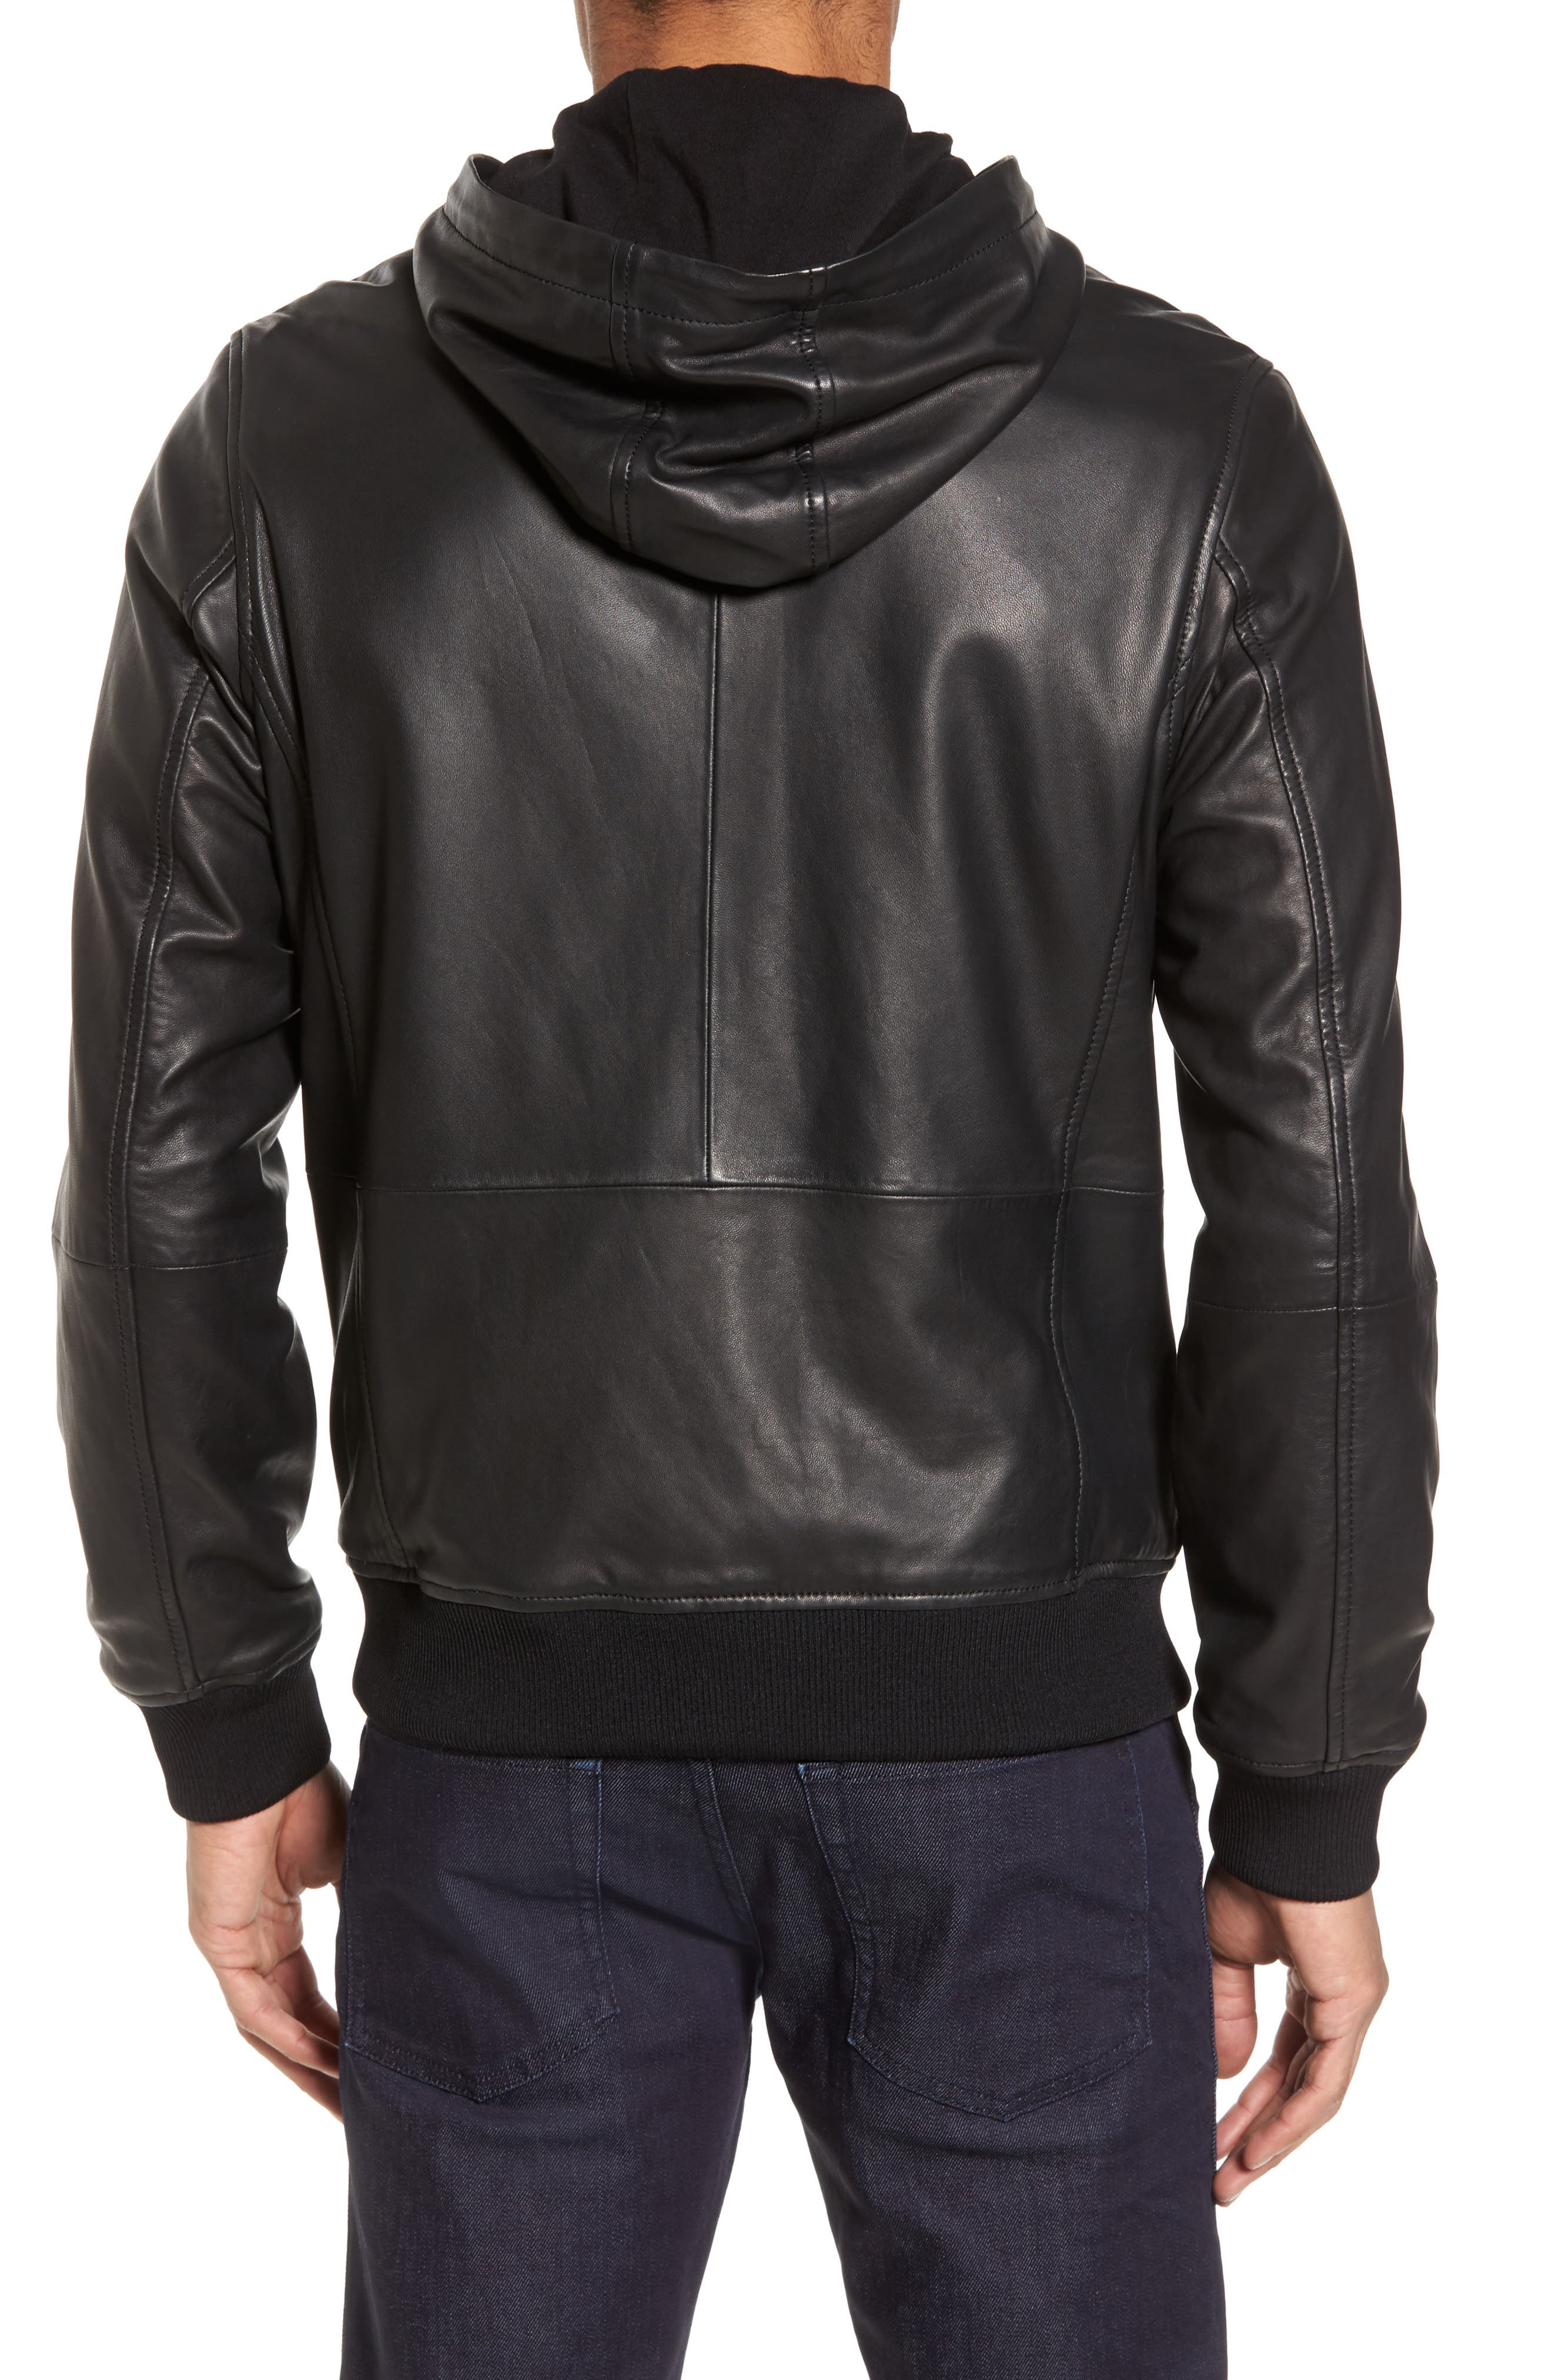 Hooded Leather Jacket,                             Alternate thumbnail 2, color,                             Black